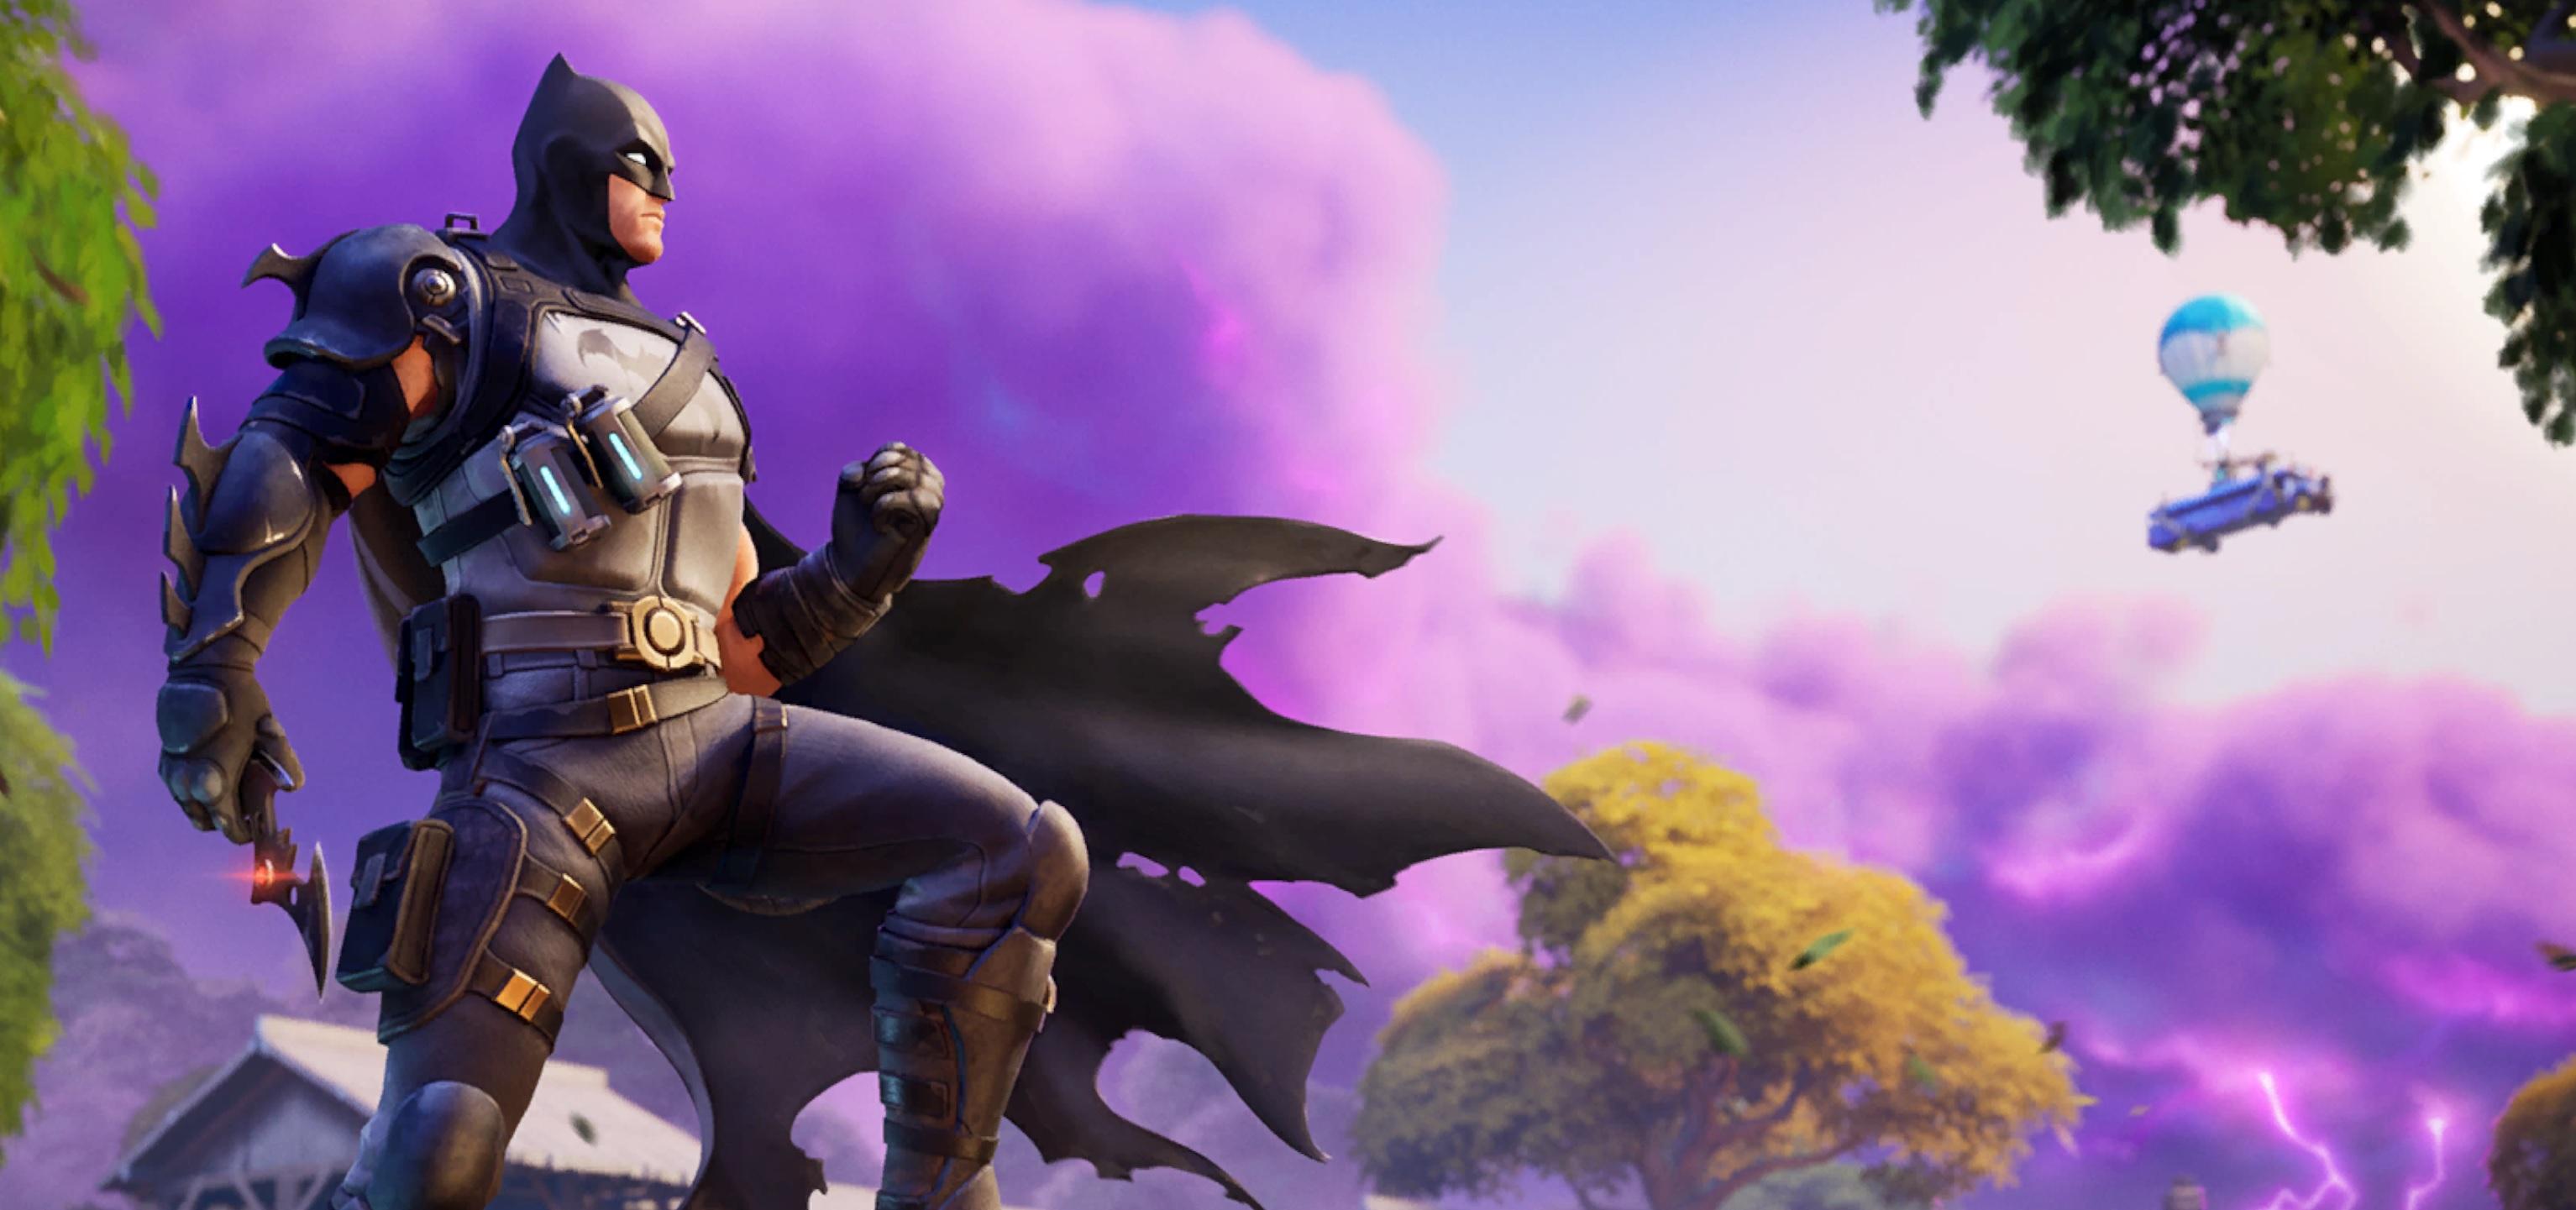 Batman enters Fortnite as his second crossover comic debuts screenshot